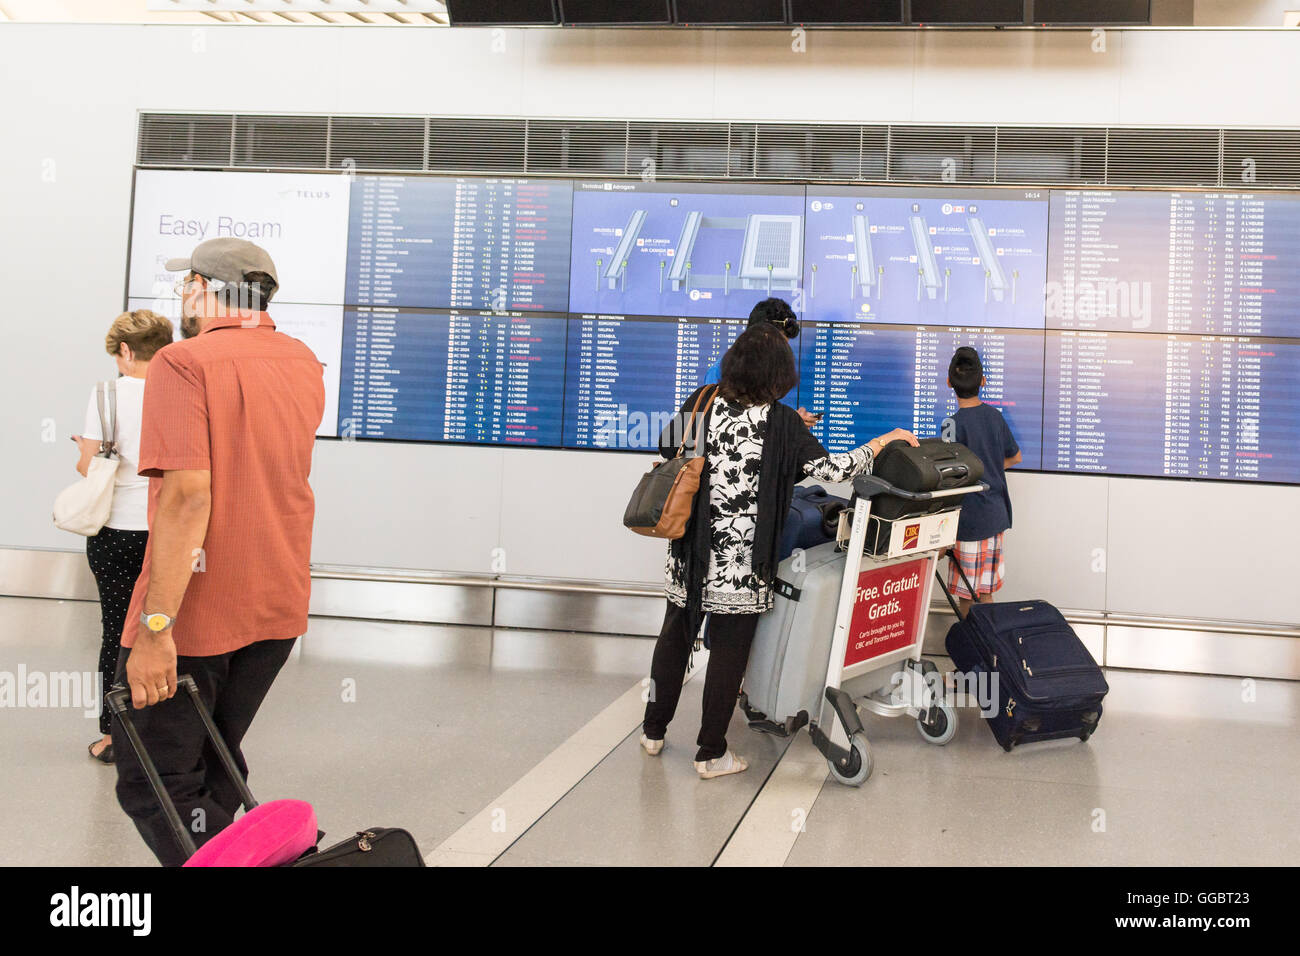 Toronto Pearson International Airport - Passagier-Familie betrachten Anzeigentafel im Terminal 1 Stockfoto